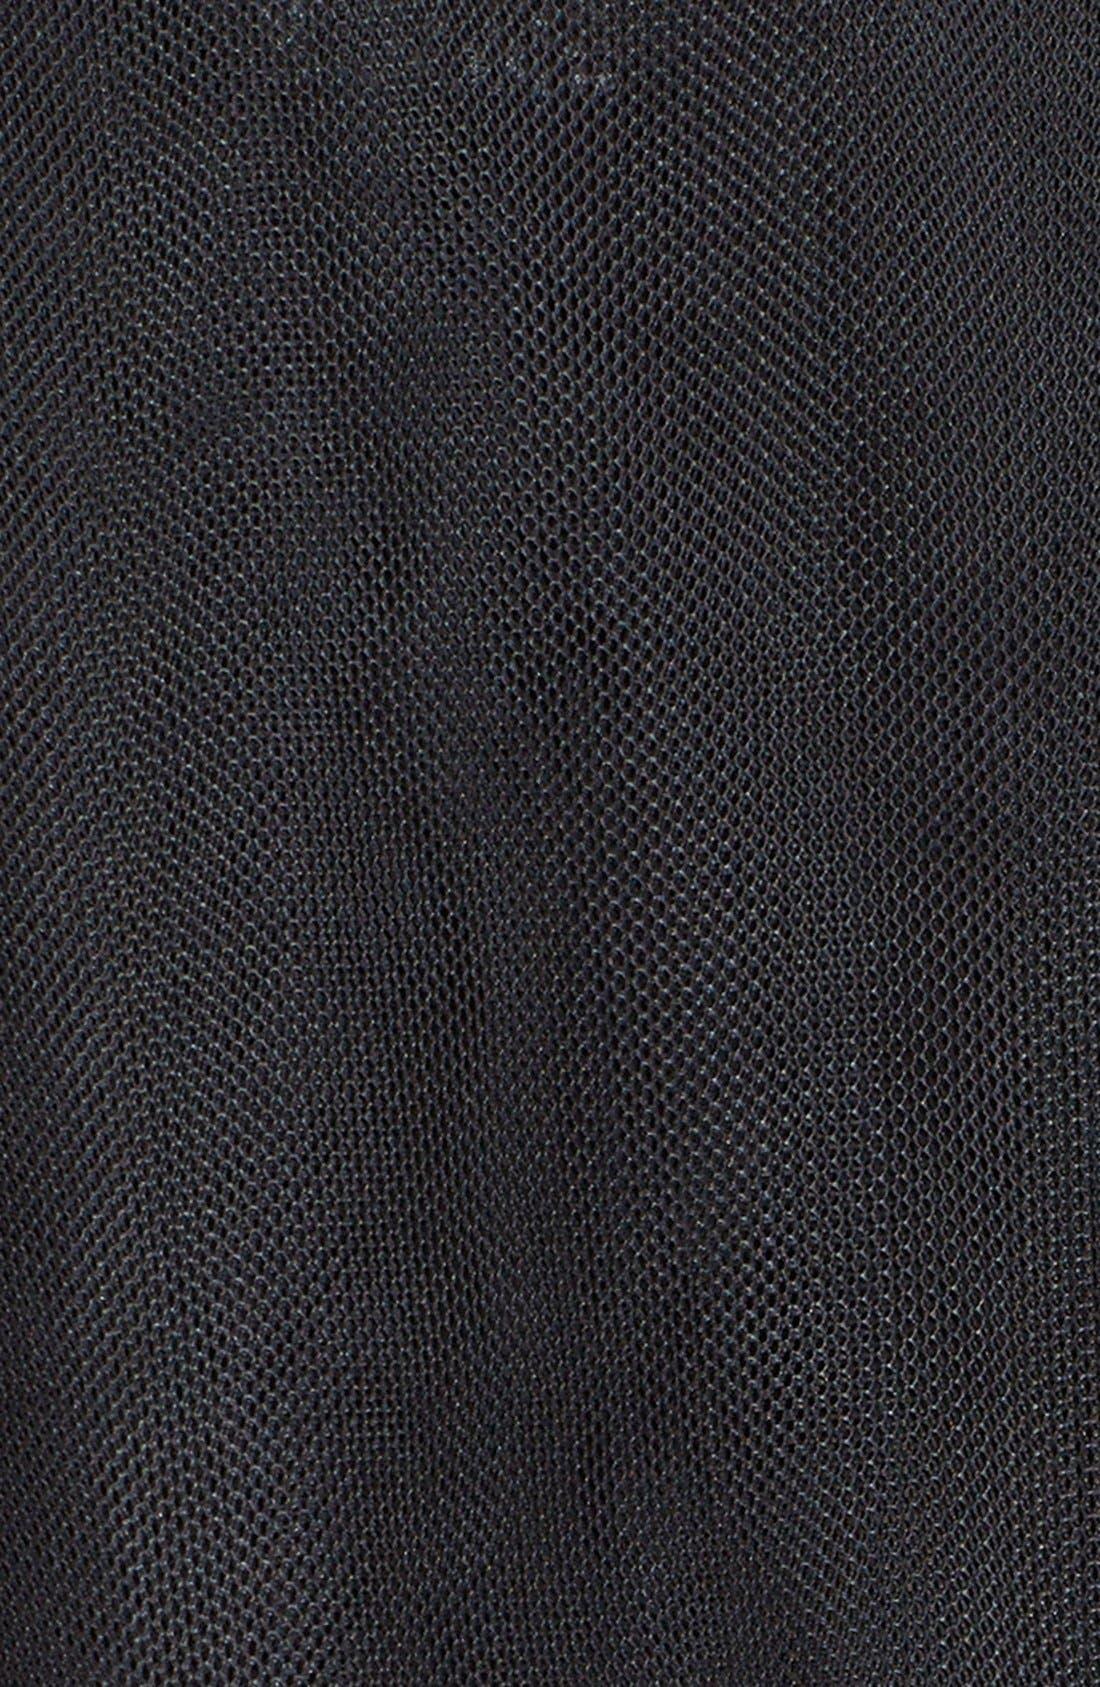 Alternate Image 3  - noir kei ninomiya Sheer Tulle Trench Coat